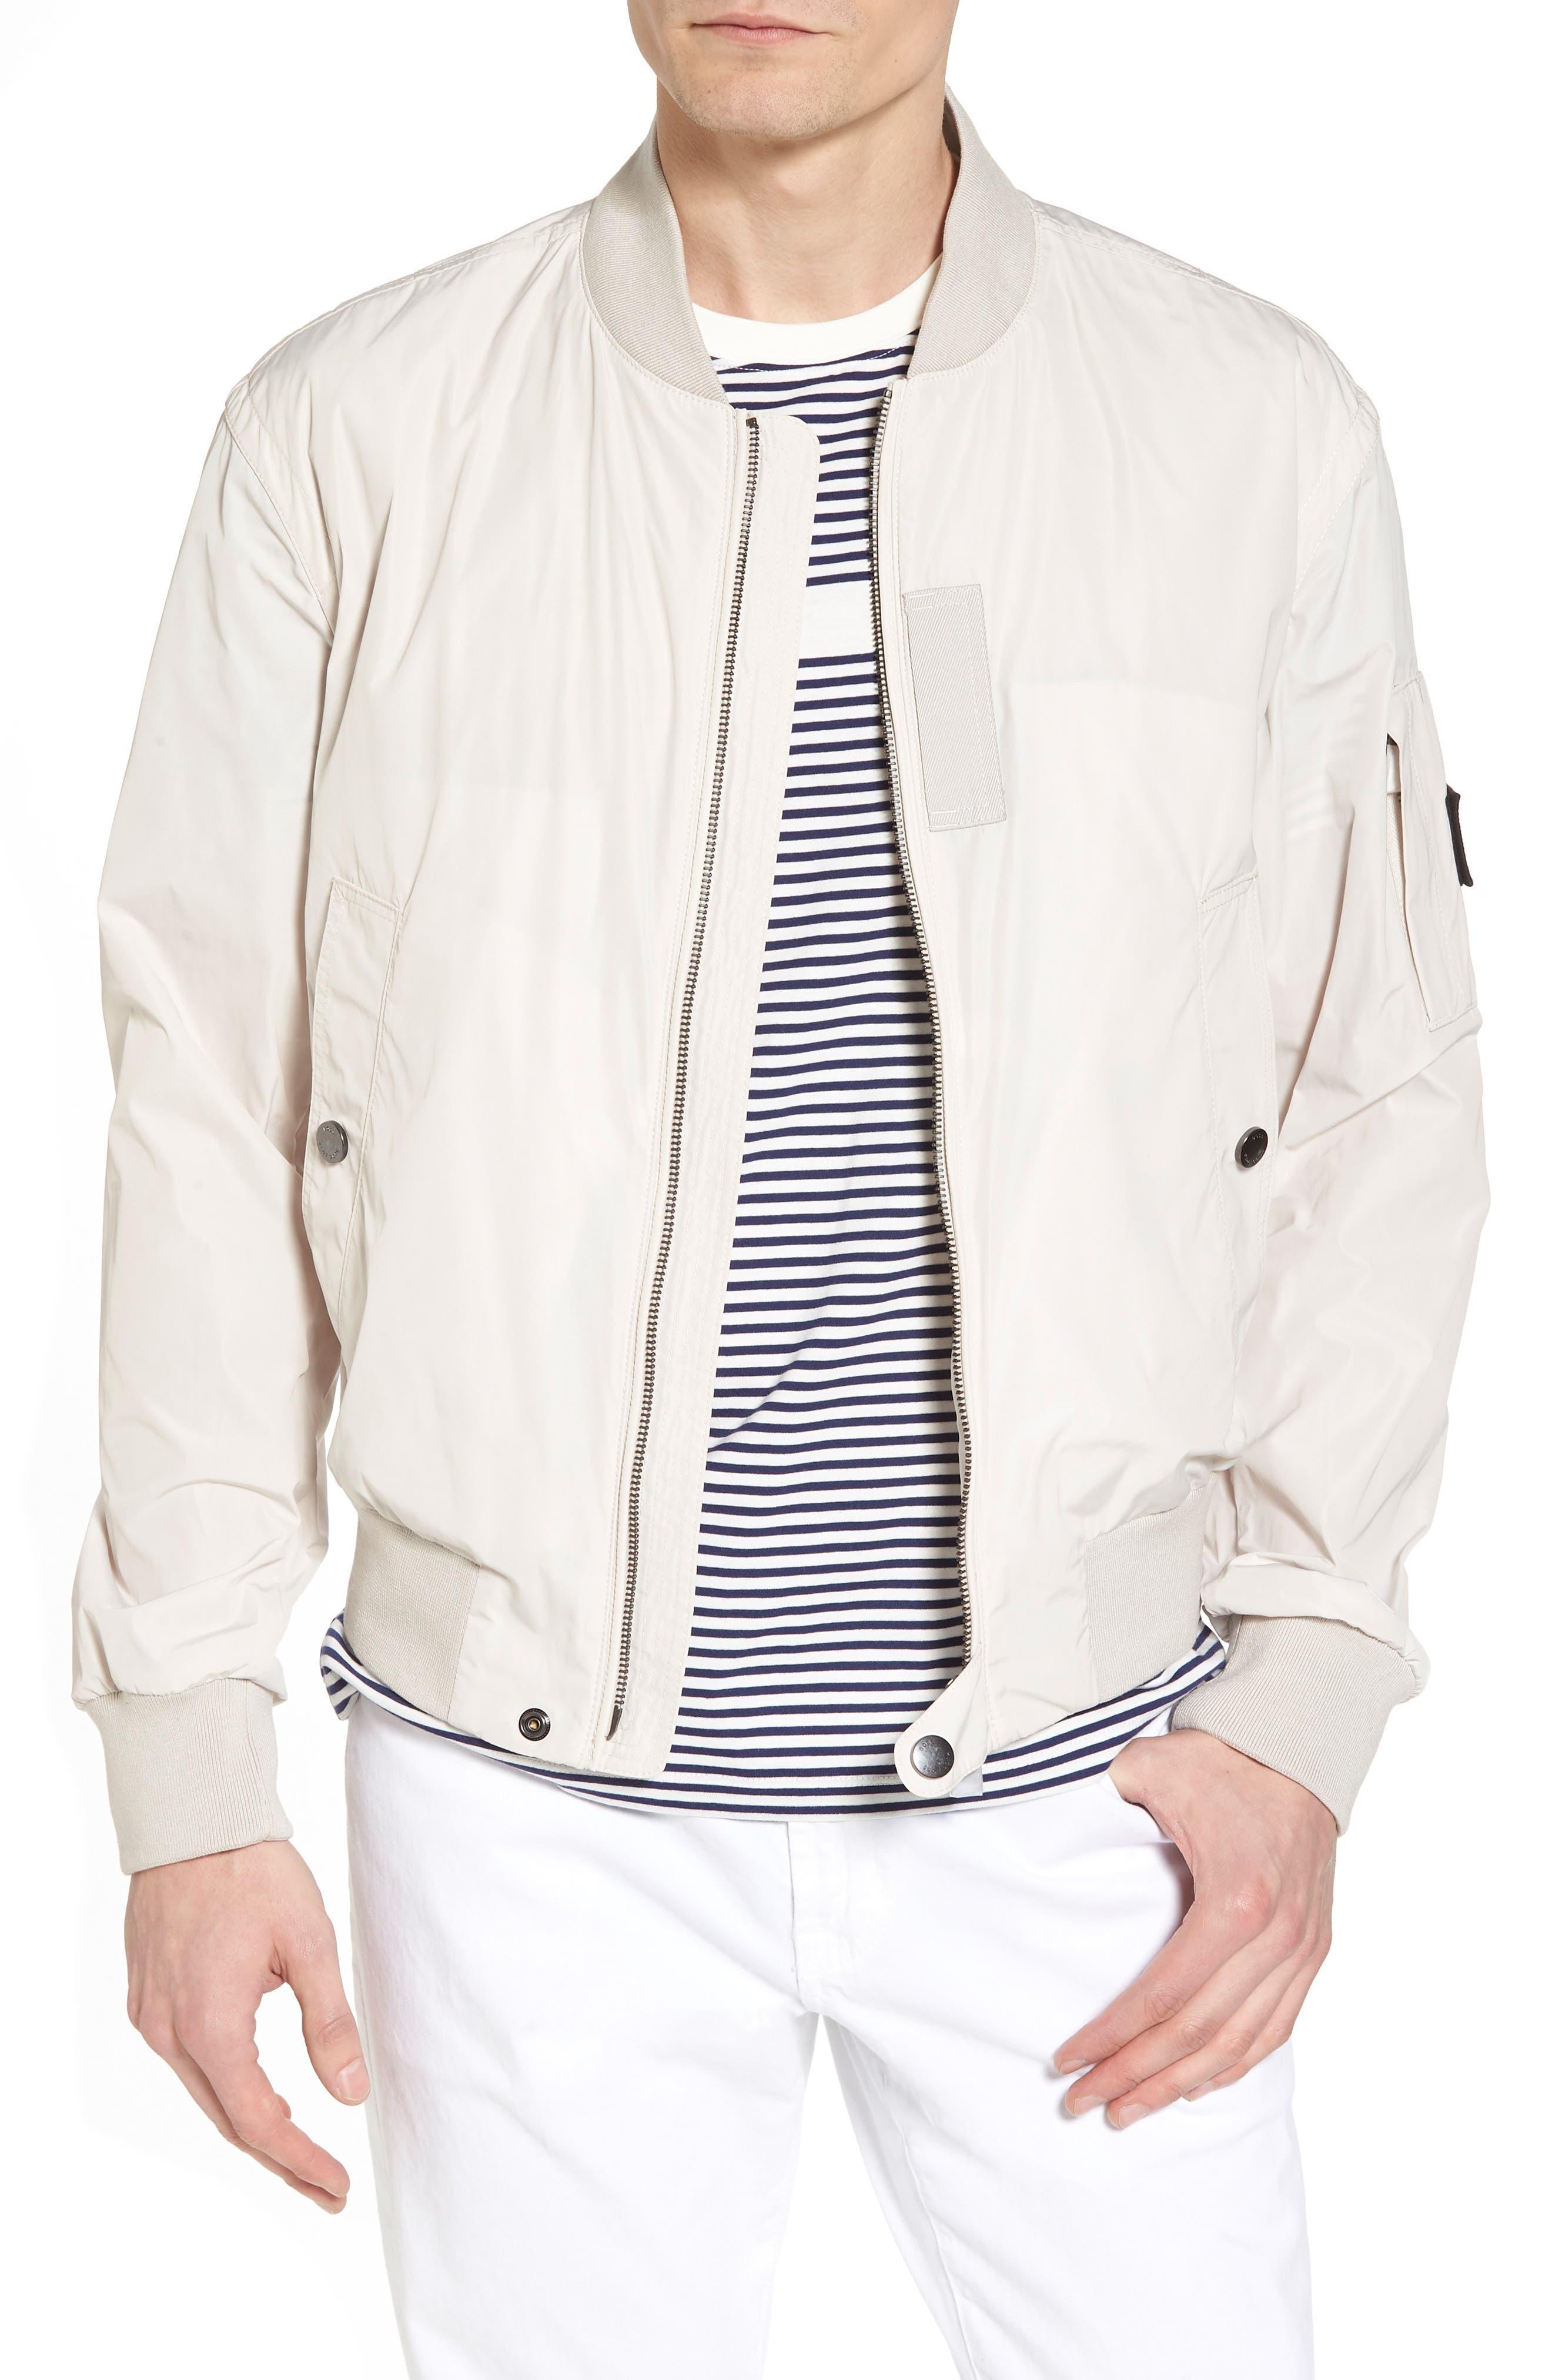 Regular Fit Bomber Jacket,                         Main,                         color, White